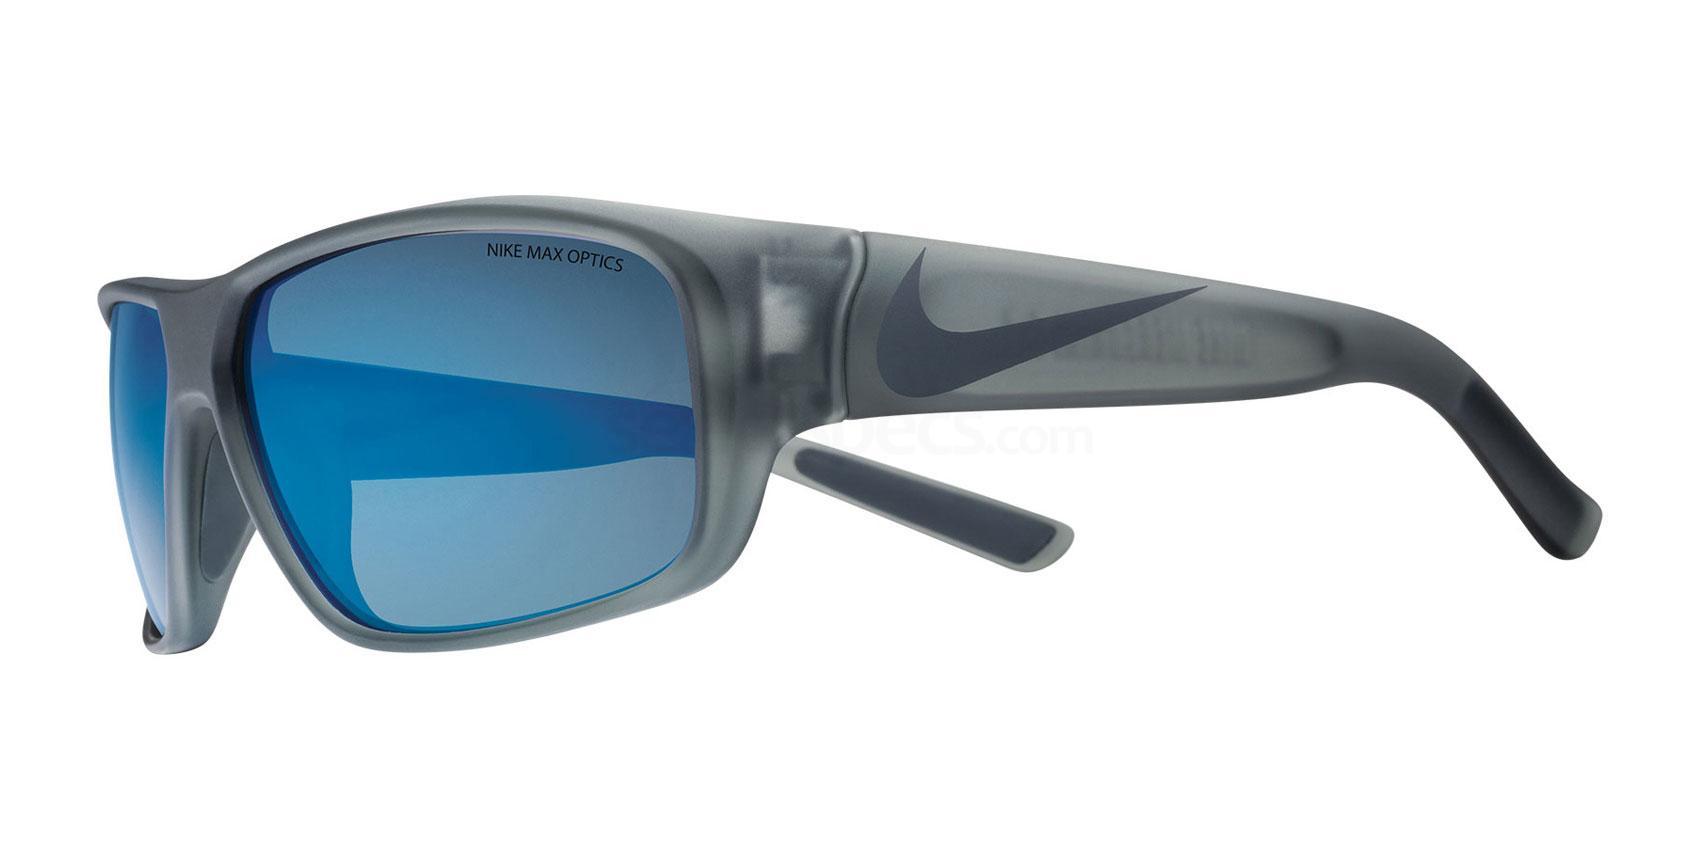 060 NIKE MERCURIAL 6.0 R EV0780 Sunglasses, Nike TEENS